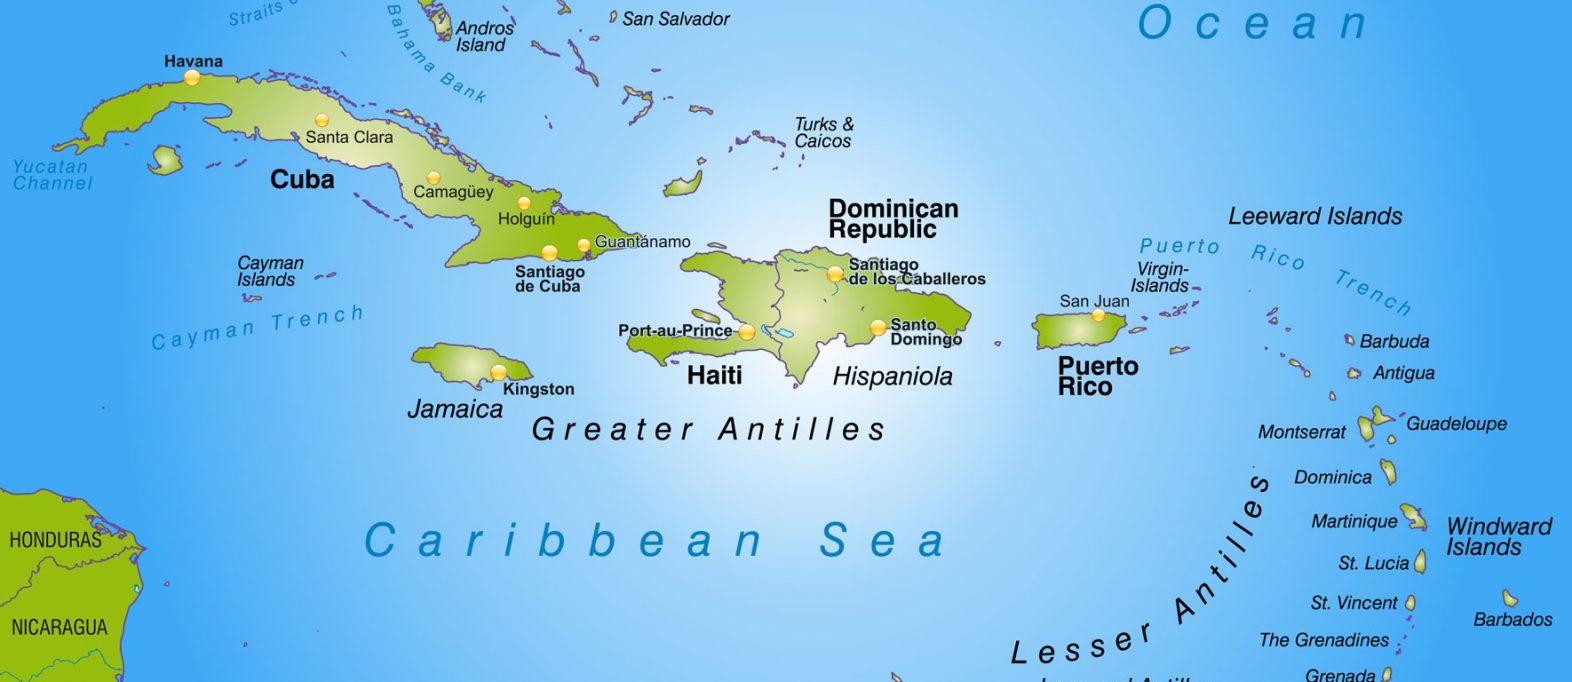 Karte der Karibik